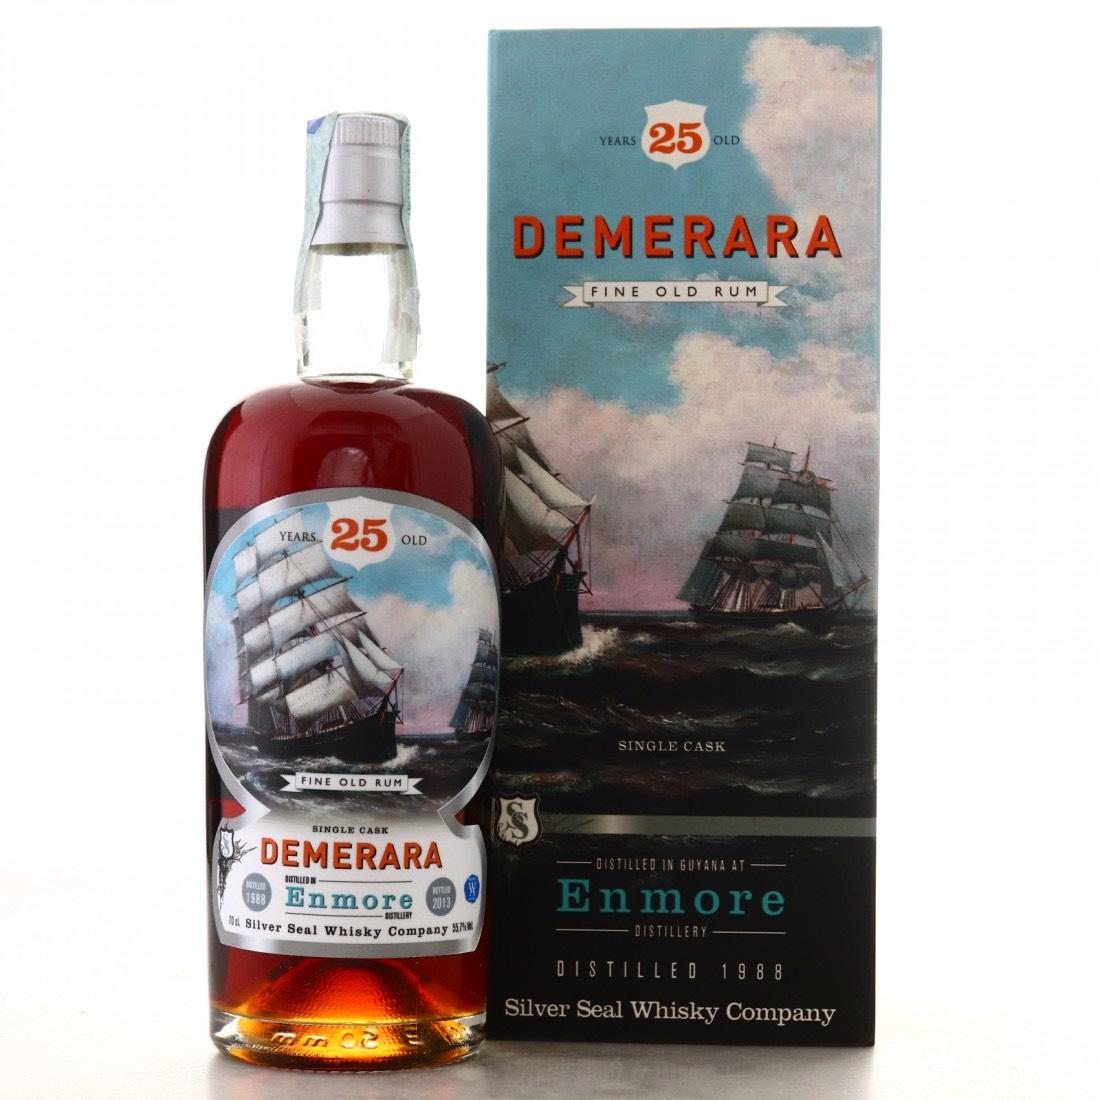 Bottle image of Demerara (Blue Label)